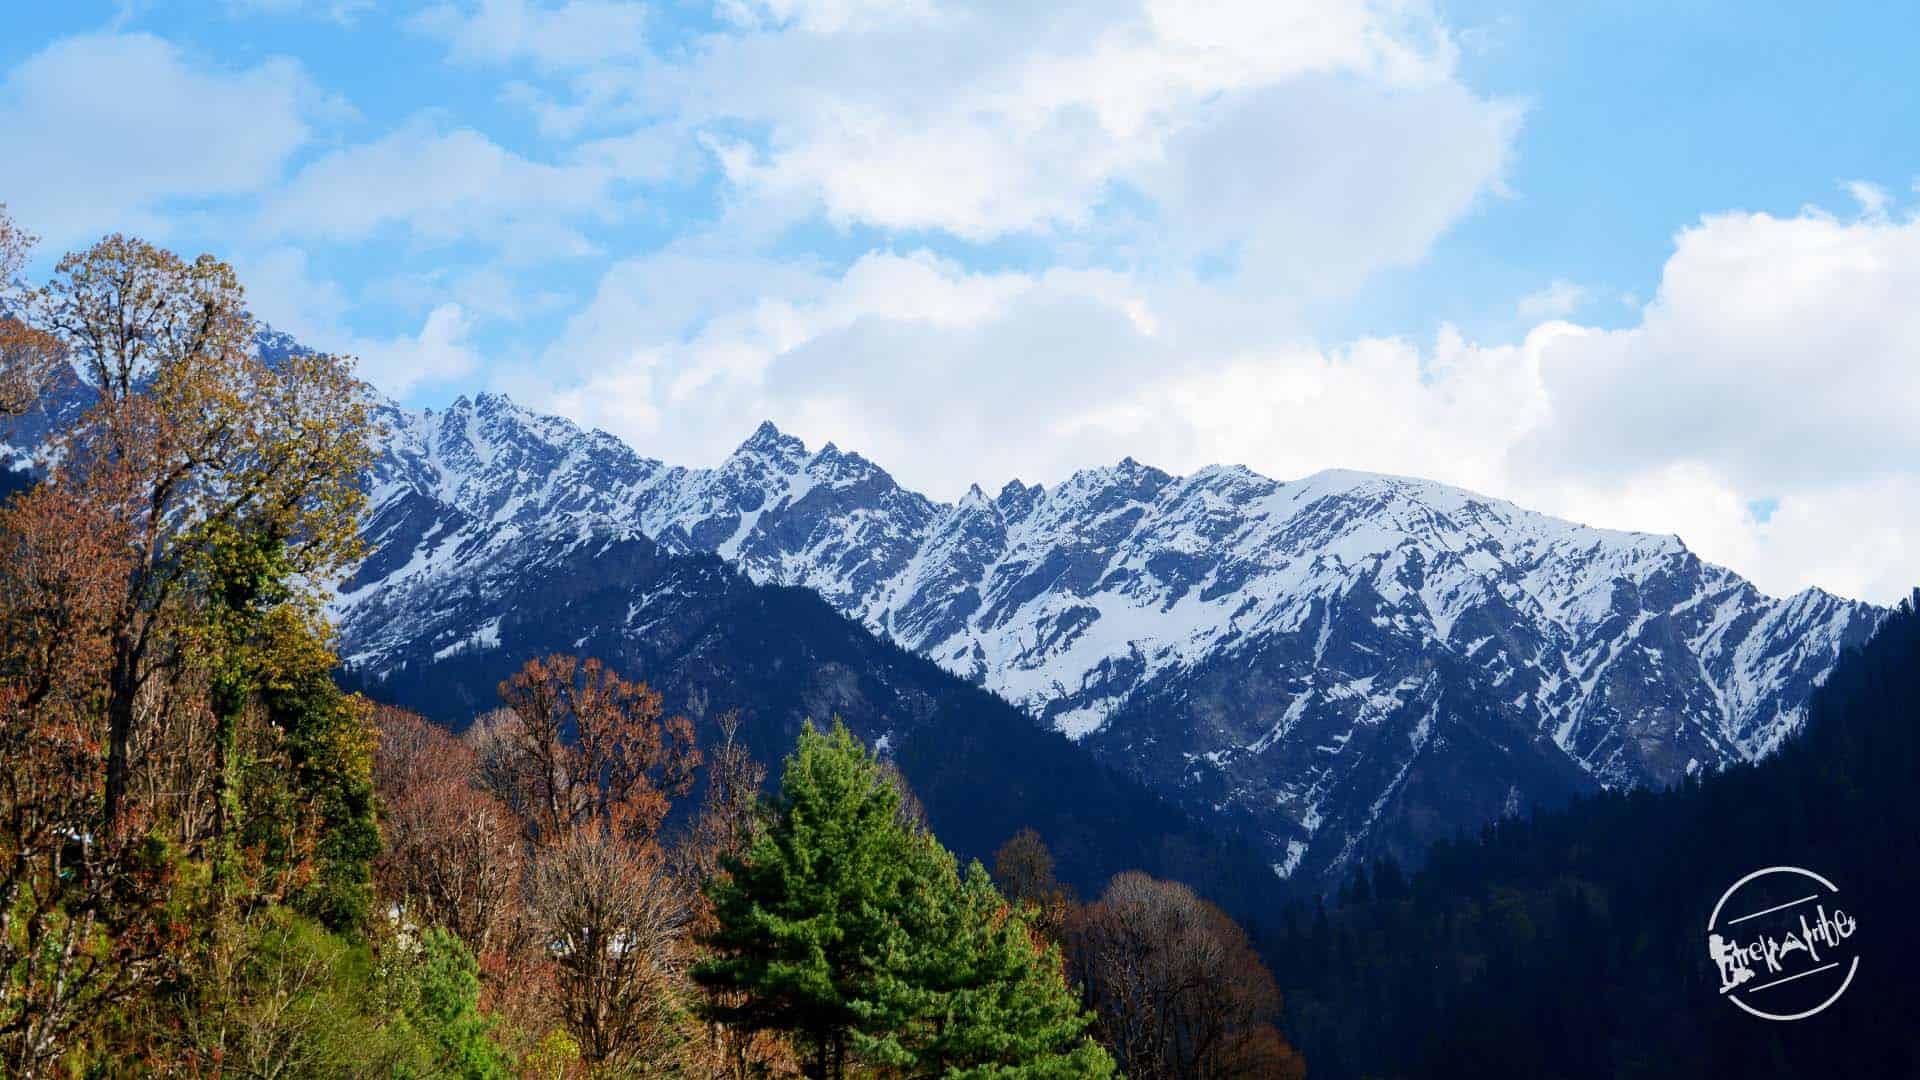 Grahan Village Trekking - Stunning view Of Parvati Valley